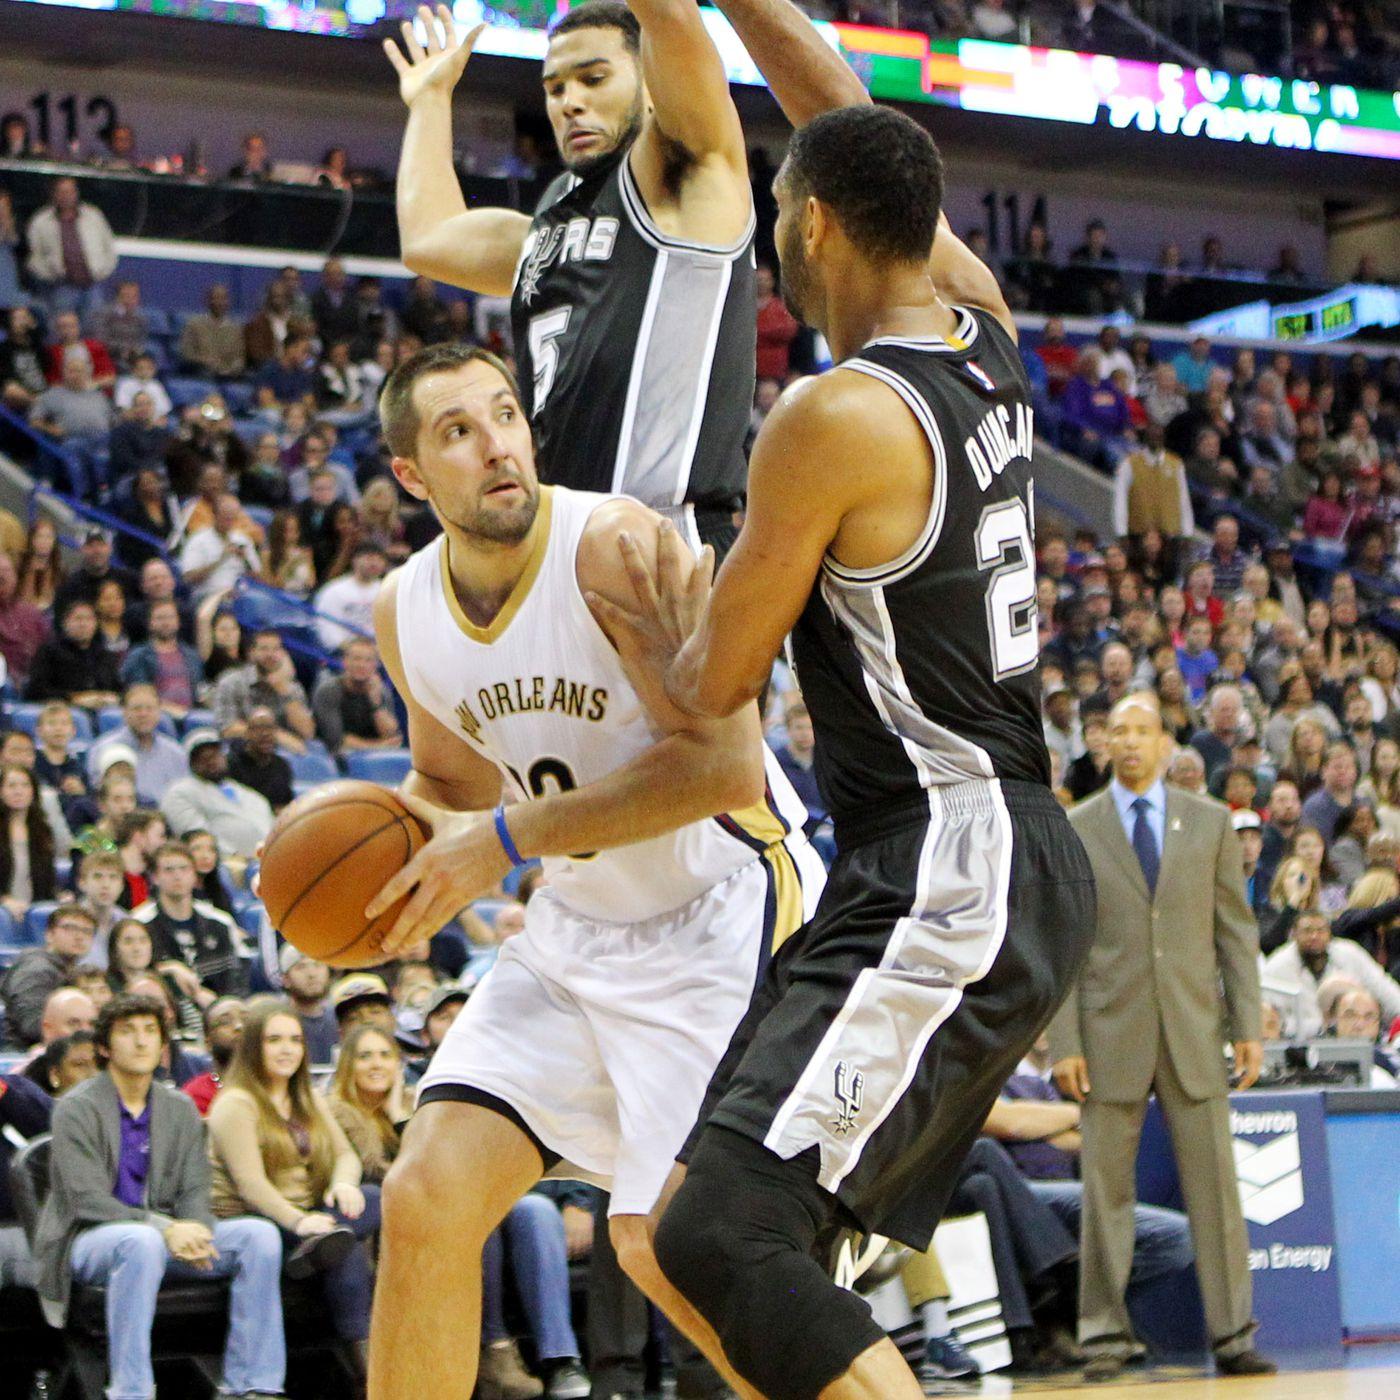 Gamethread For San Antonio Spurs At New Orleans Pelicans Apr 15 2015 7 00 Pm Cdt Pounding The Rock